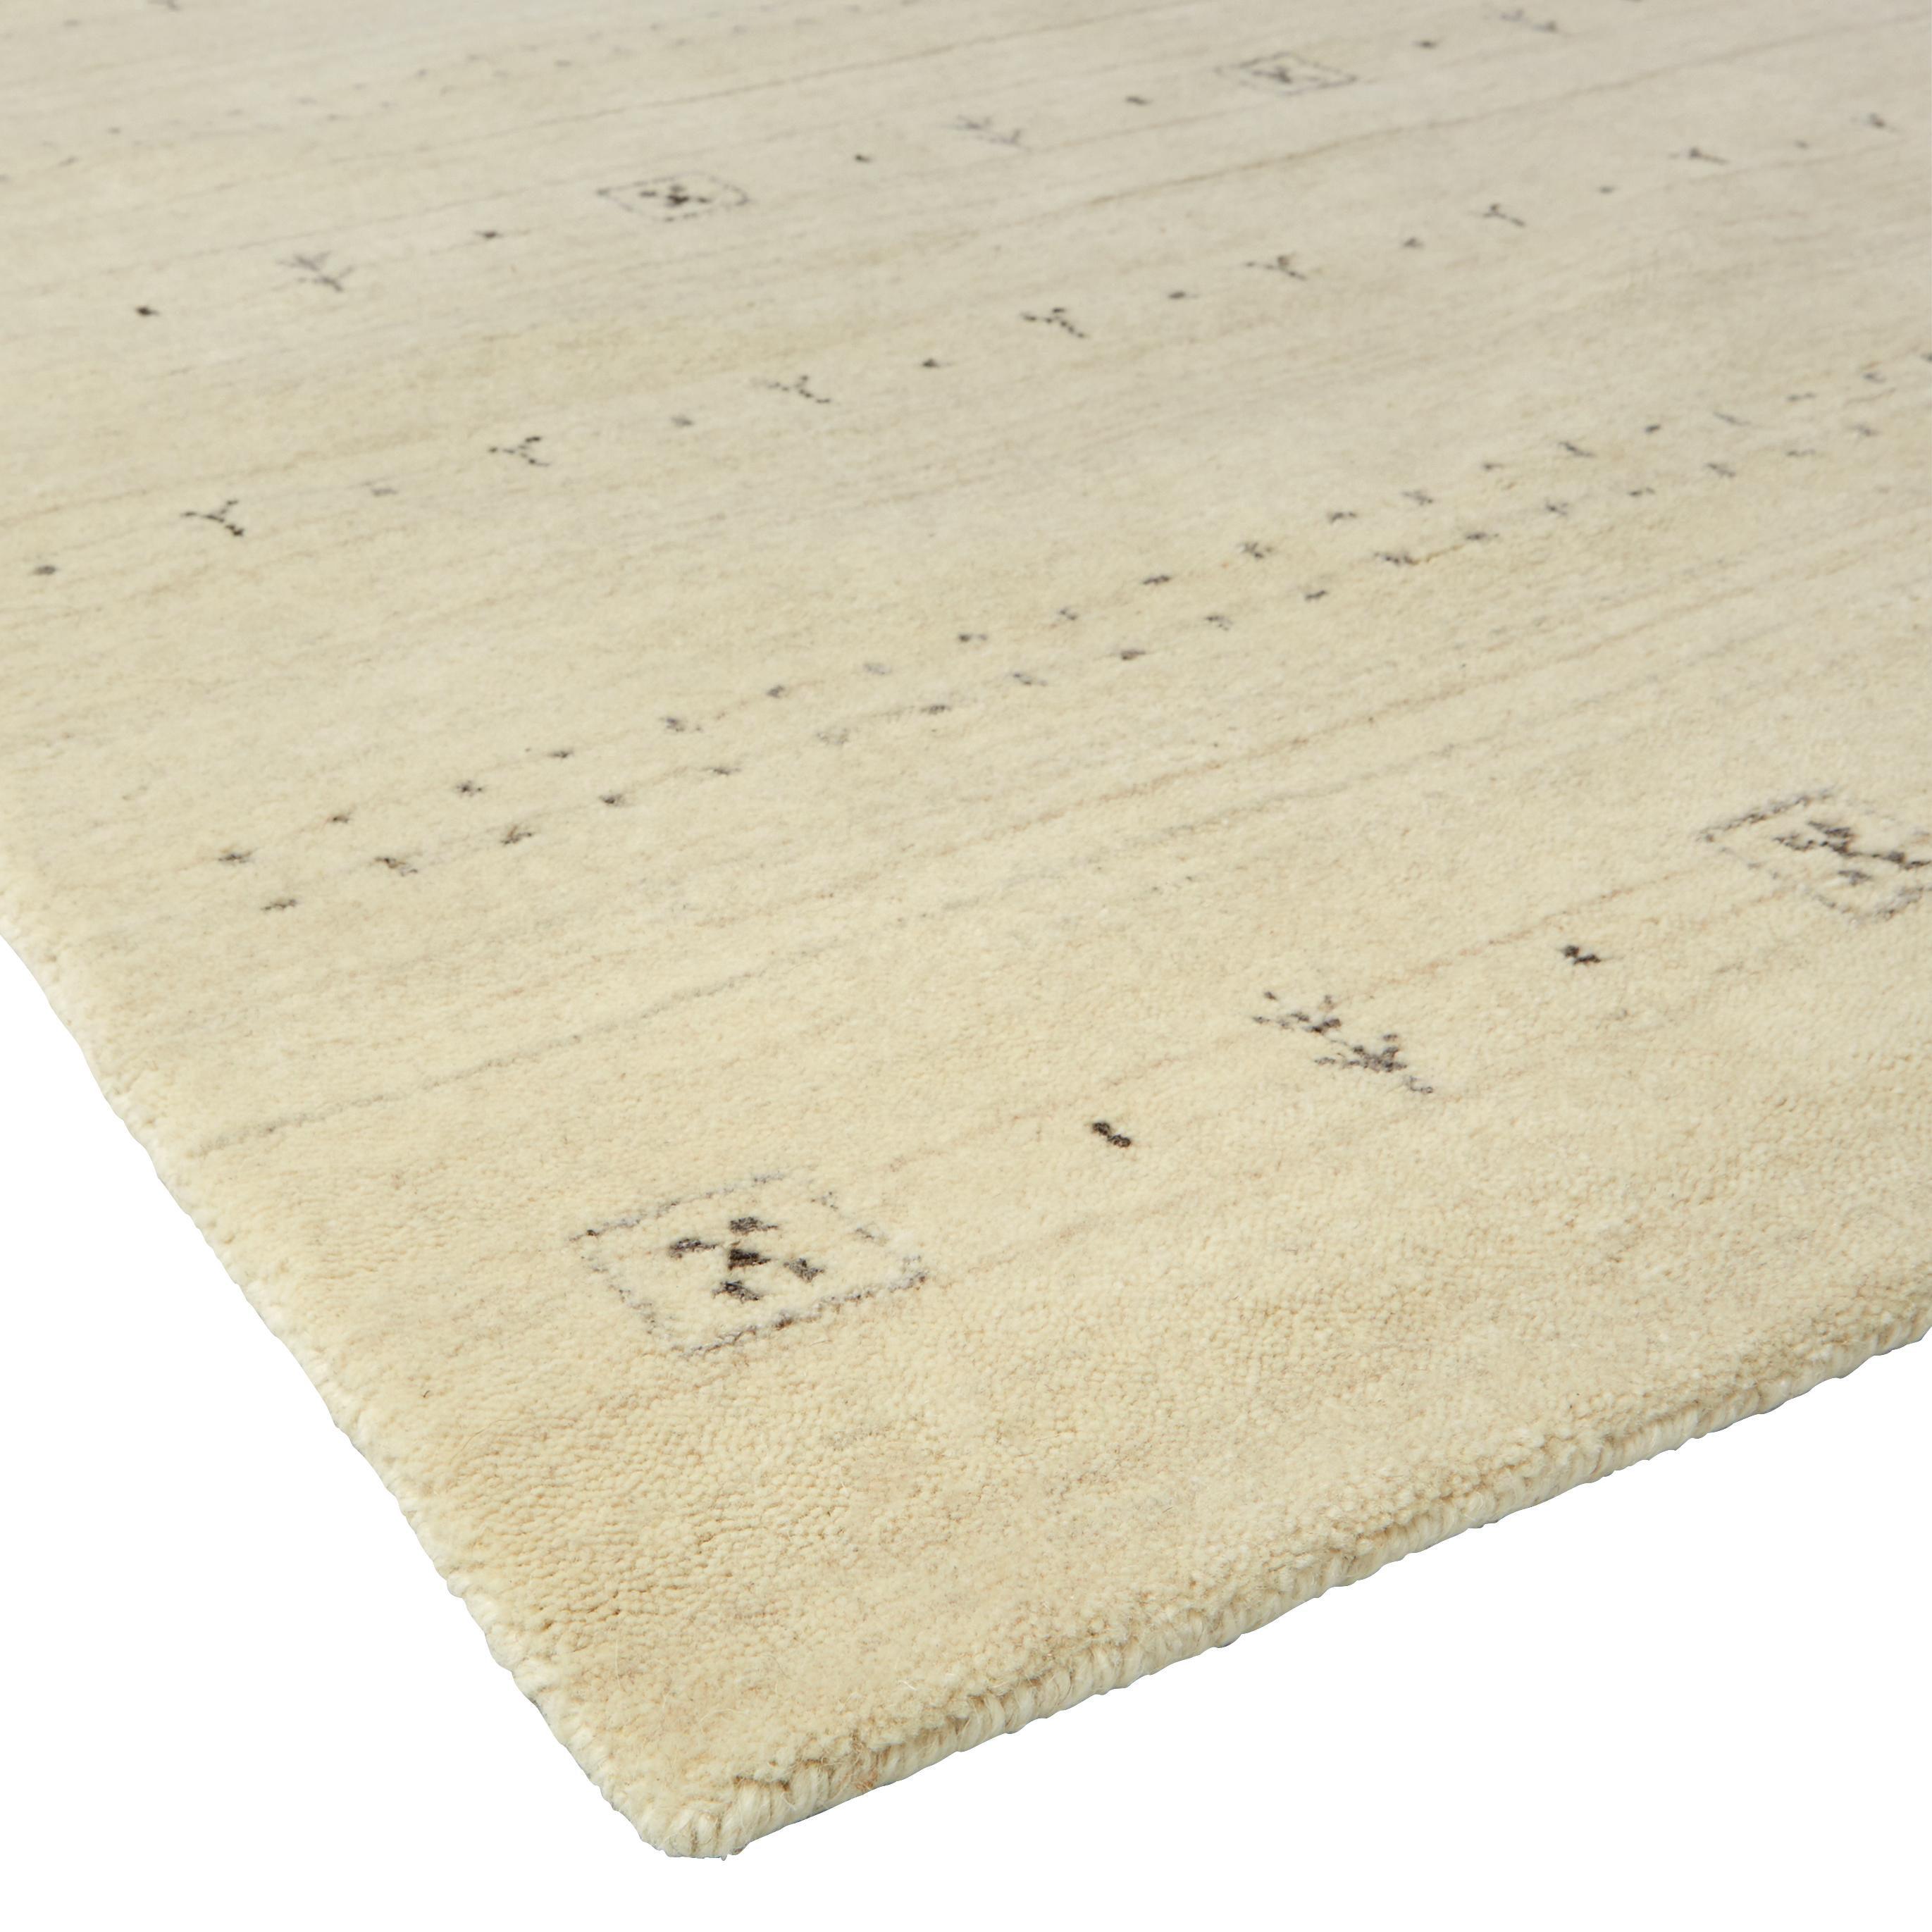 ORIENTALISK MATTA 60/90 cm  - naturfärgad, Lifestyle, textil (60/90cm) - Esposa